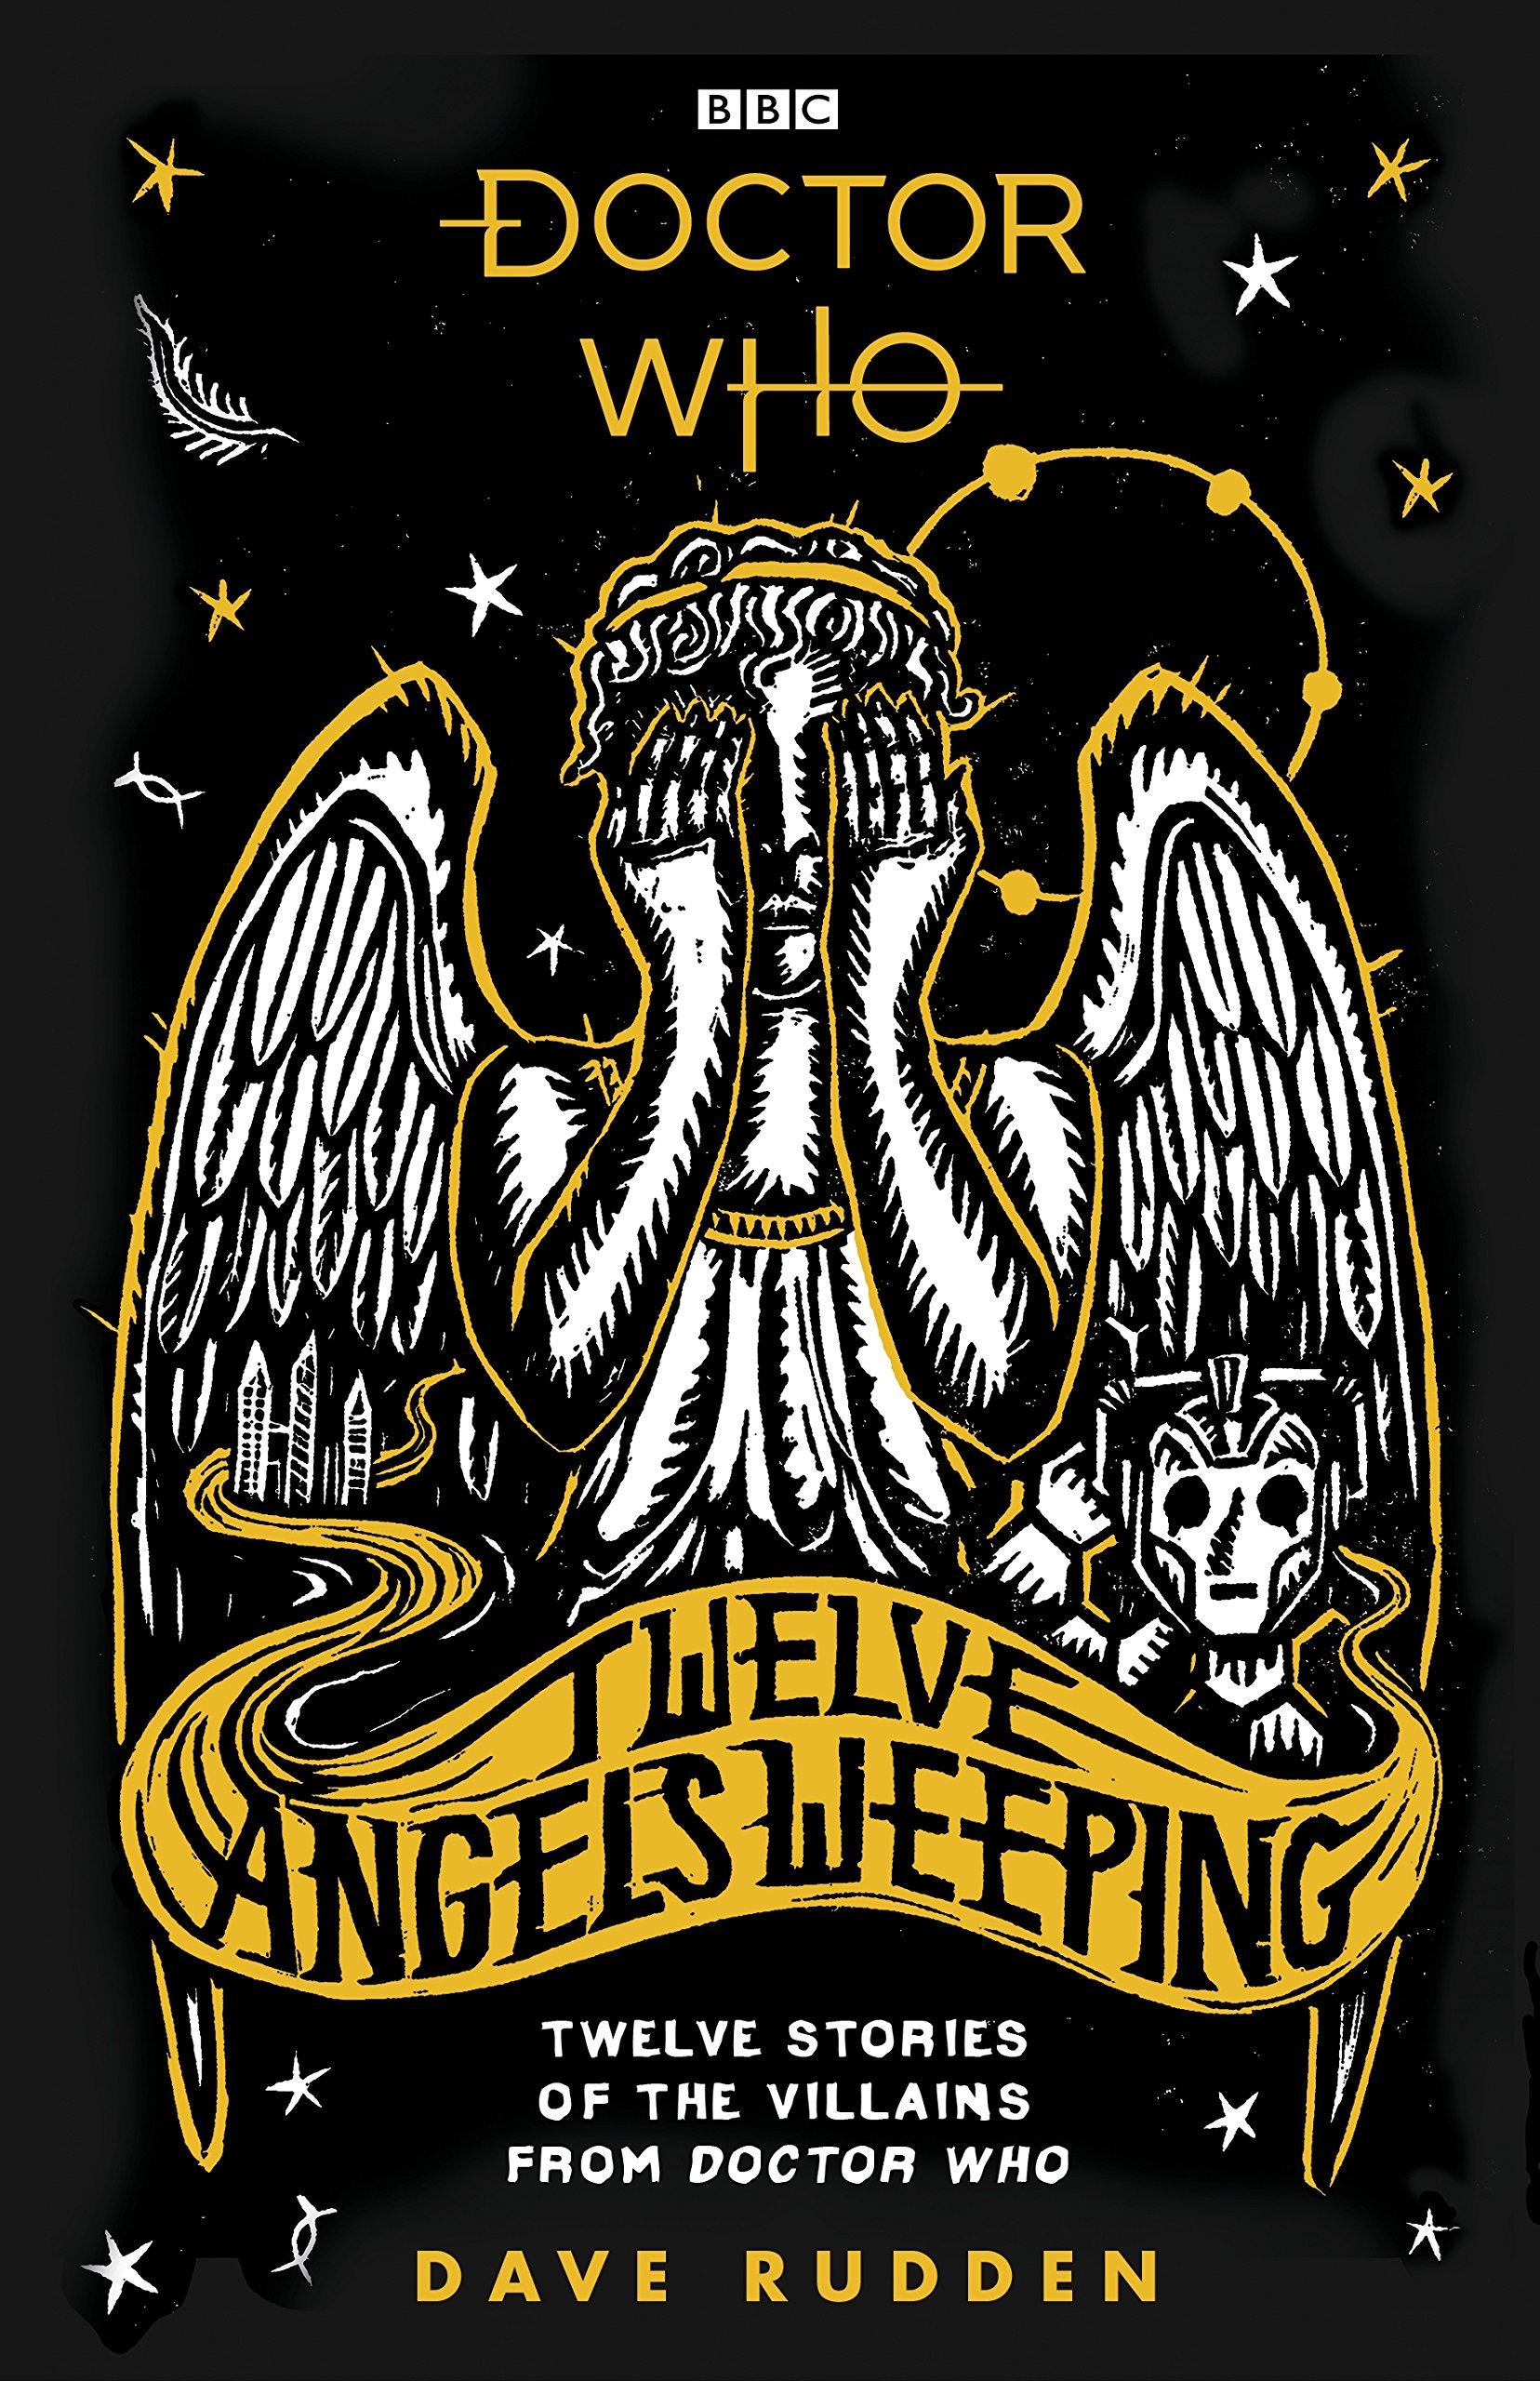 Twelve Angels Weeping (anthology)